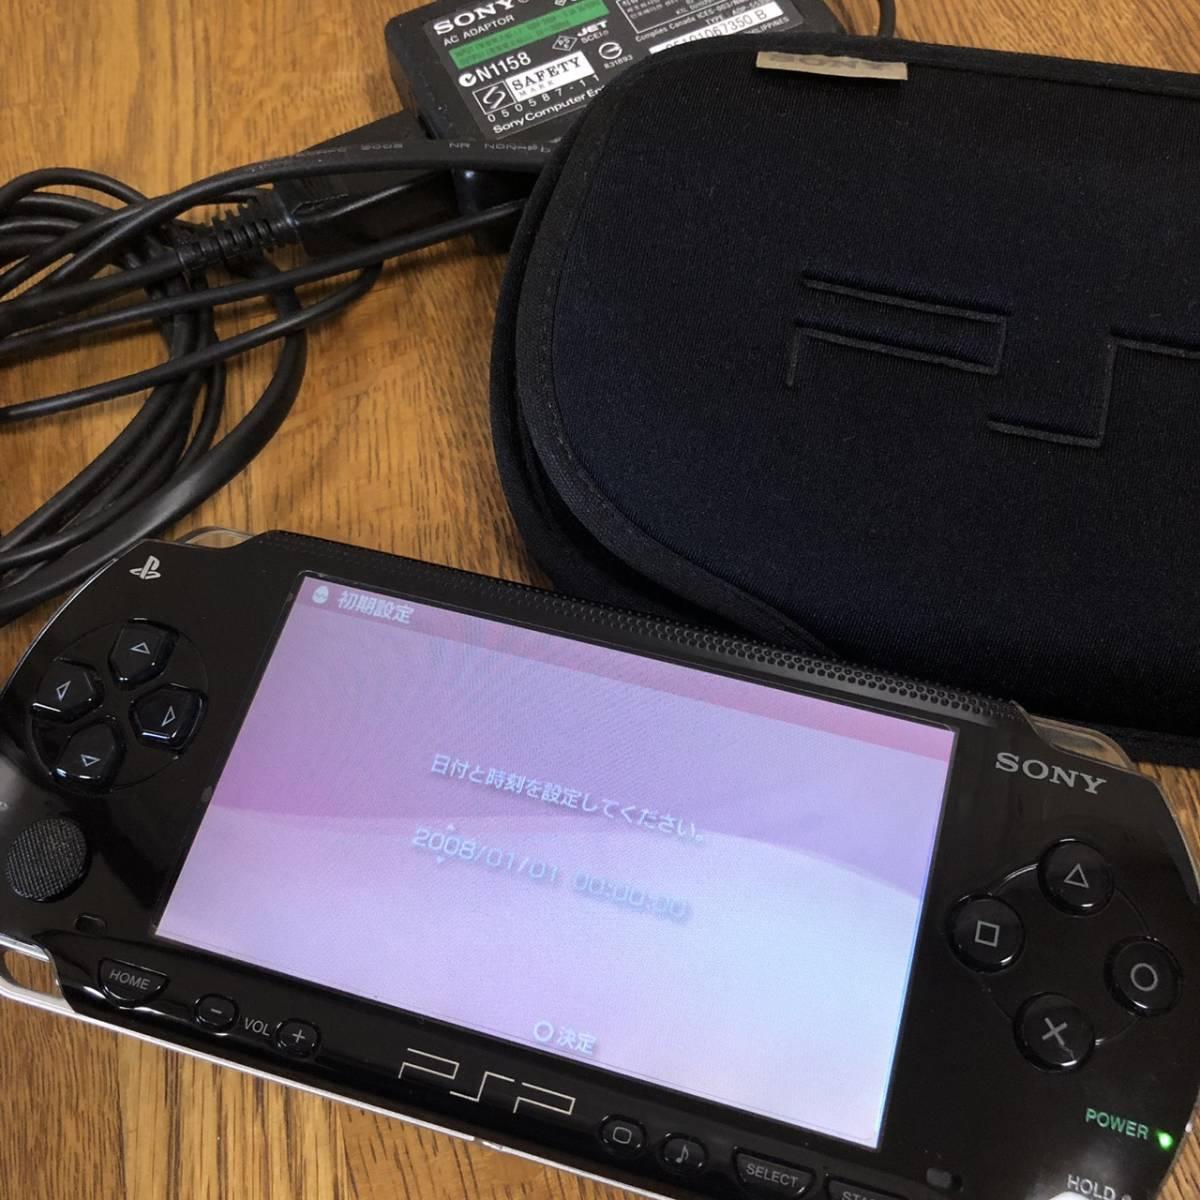 SONY PSP ソニー プレイステーションポータブル 本体 充電器 美品